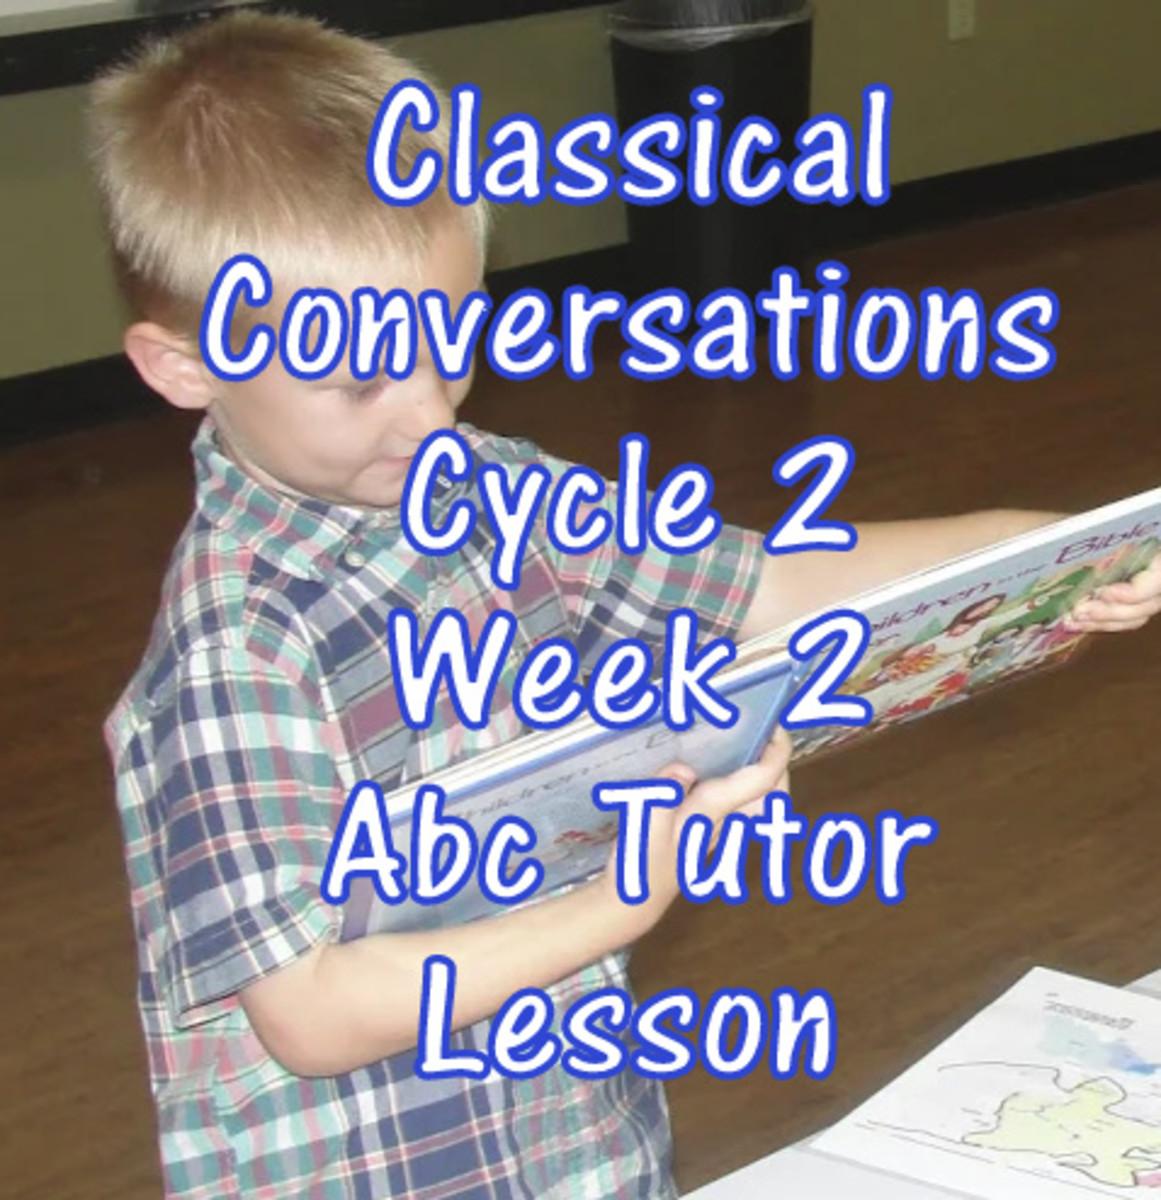 Cc Cycle 2 Week 2 Lesson For Abecedarian Tutors